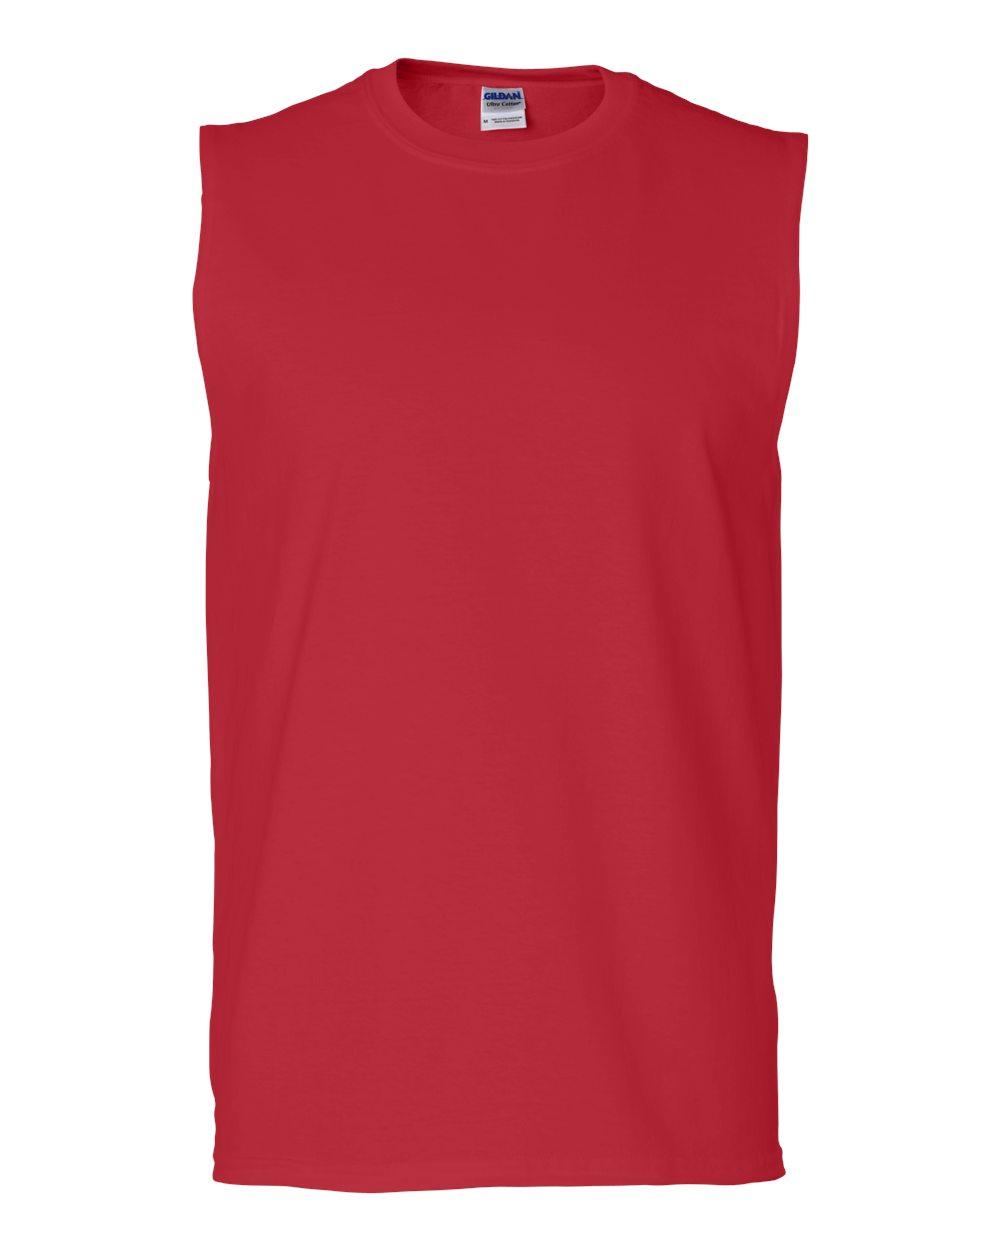 1ff8202bd47a Gildan 2700 - Ultra Cotton™ Sleeveless T-Shirt   Needen USA